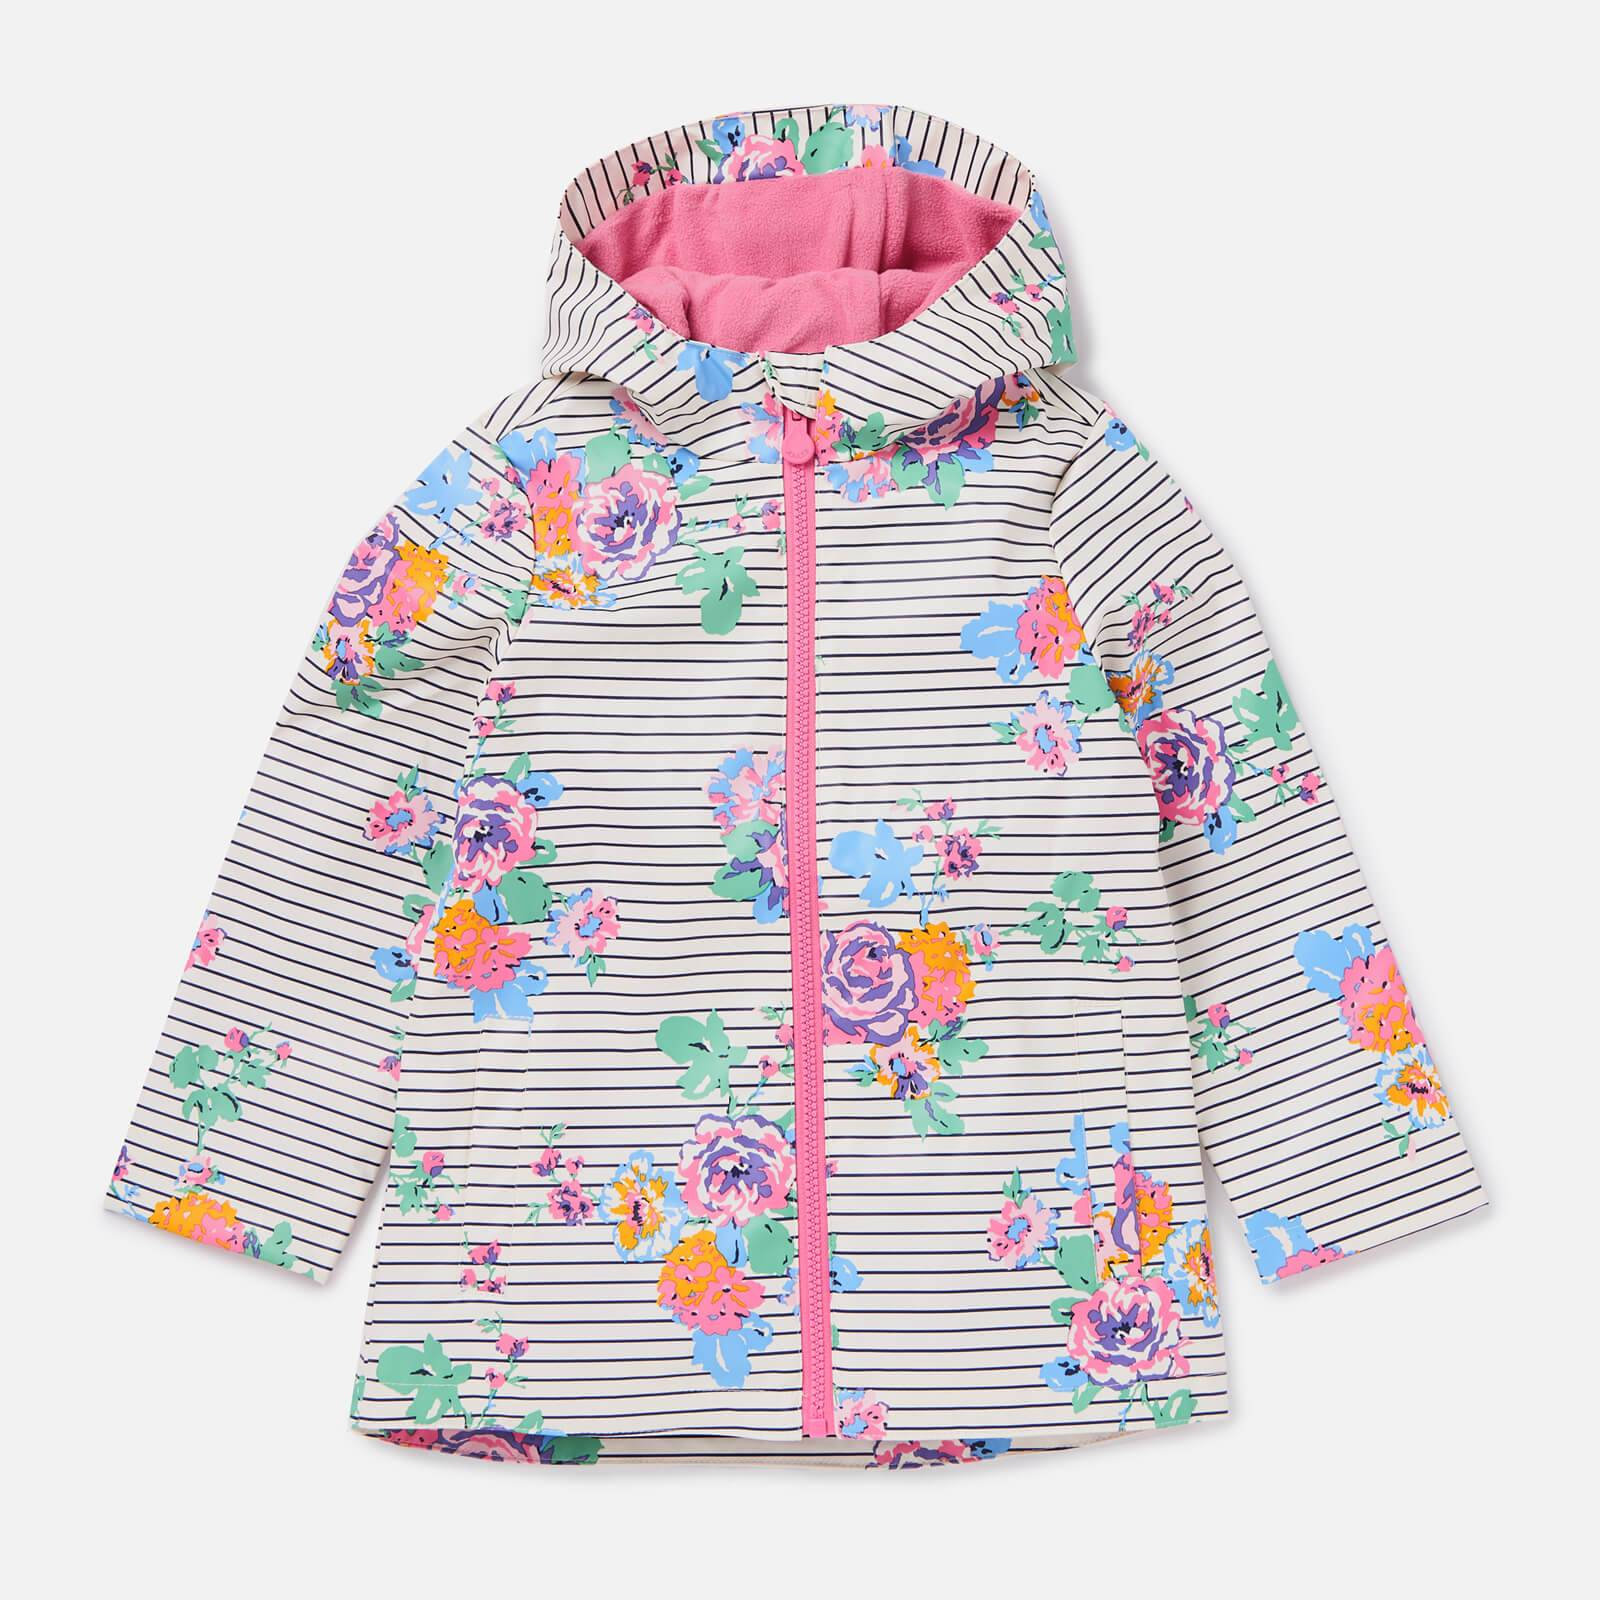 Joules Girls' Raindance Showerproof Rubber Coat - Cream Navy Floral - 5 Years